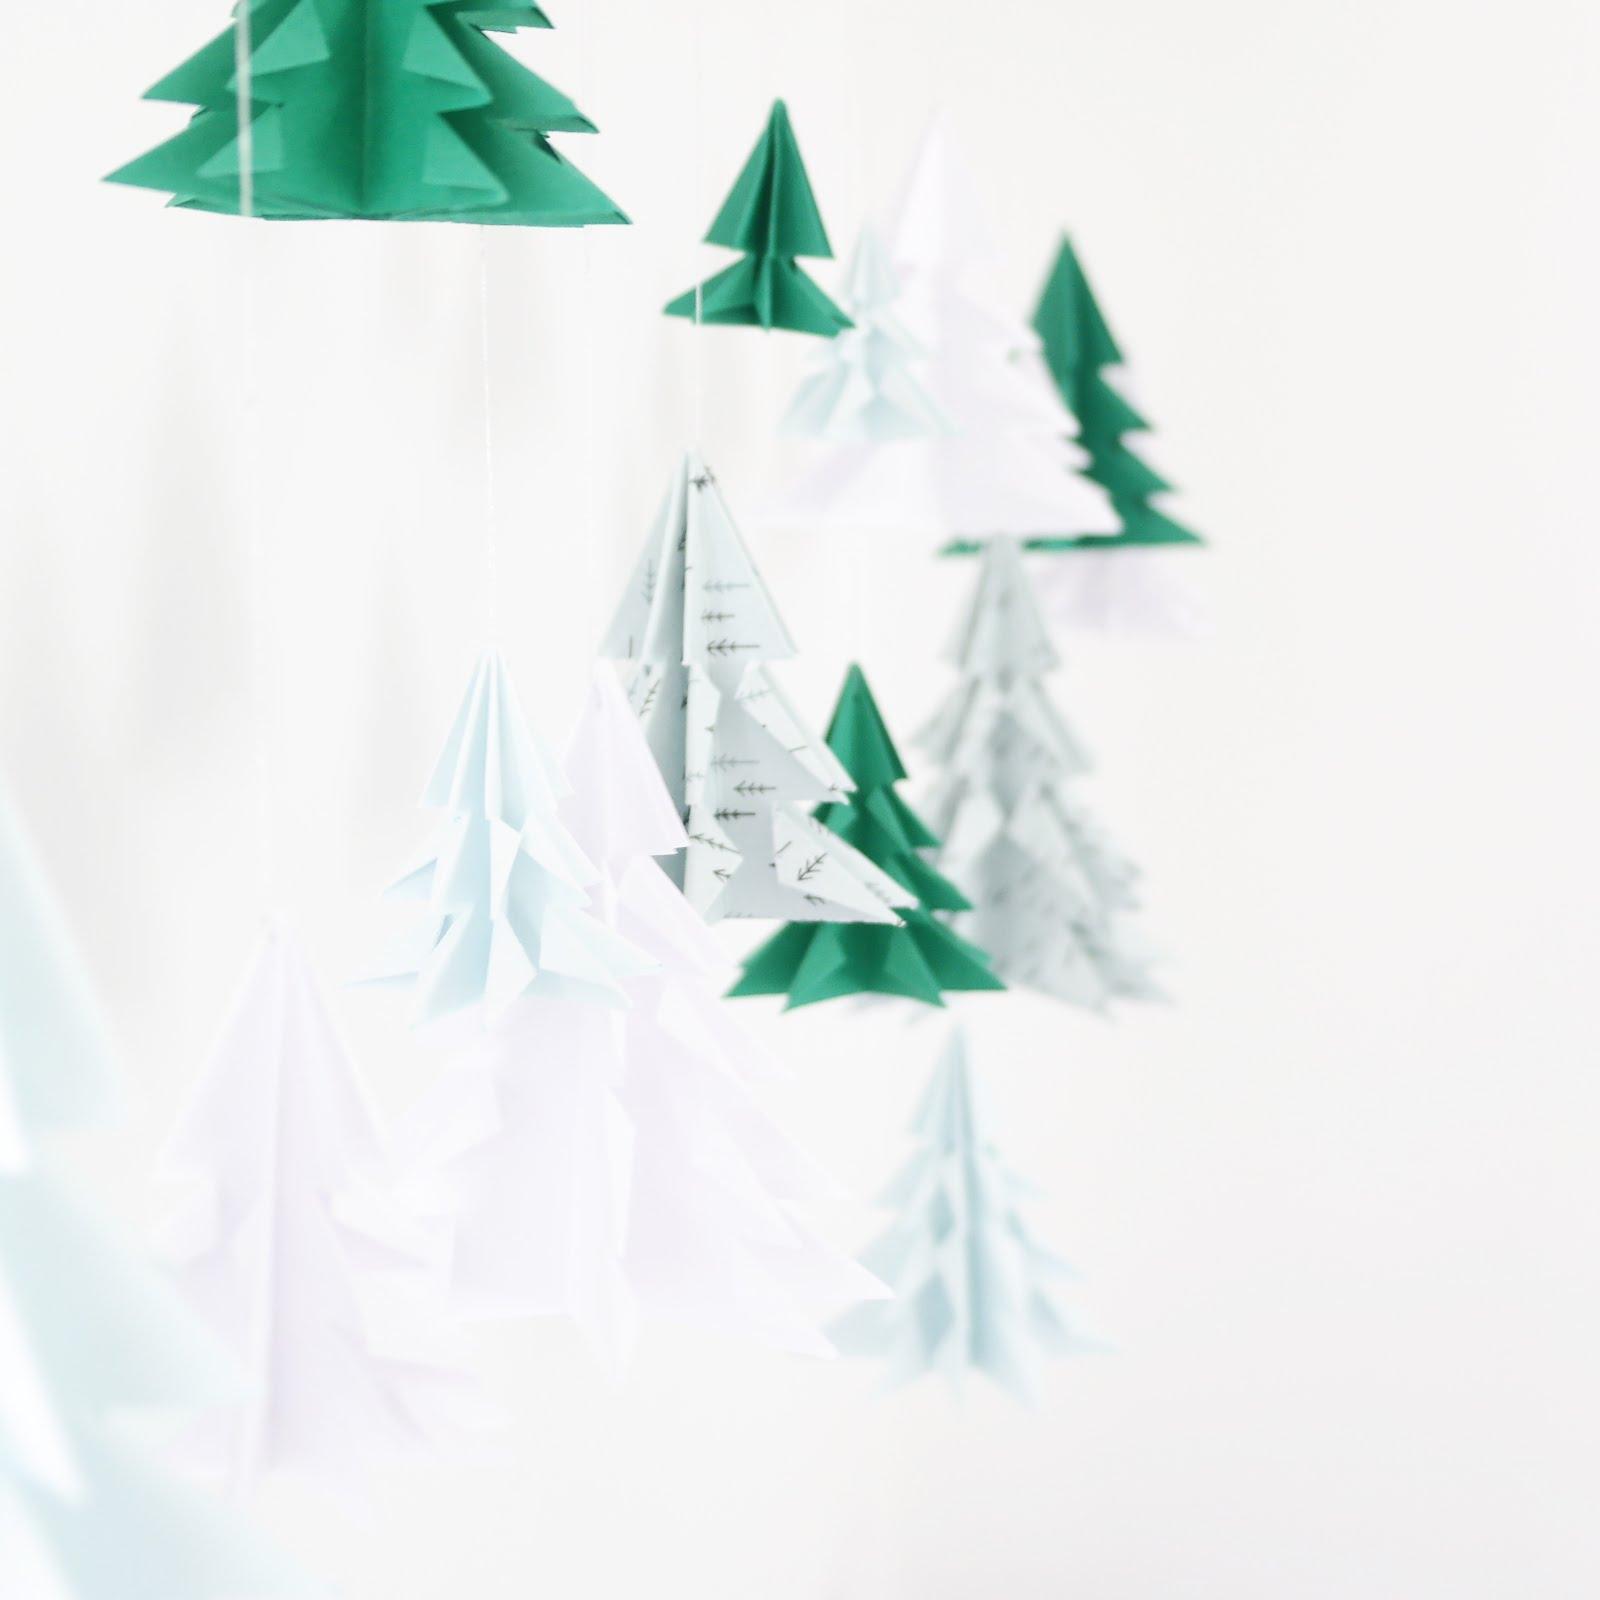 Diy - Guirlande De Sapins Origami - Stacey Stachetti pour Origami Sapin De Noel